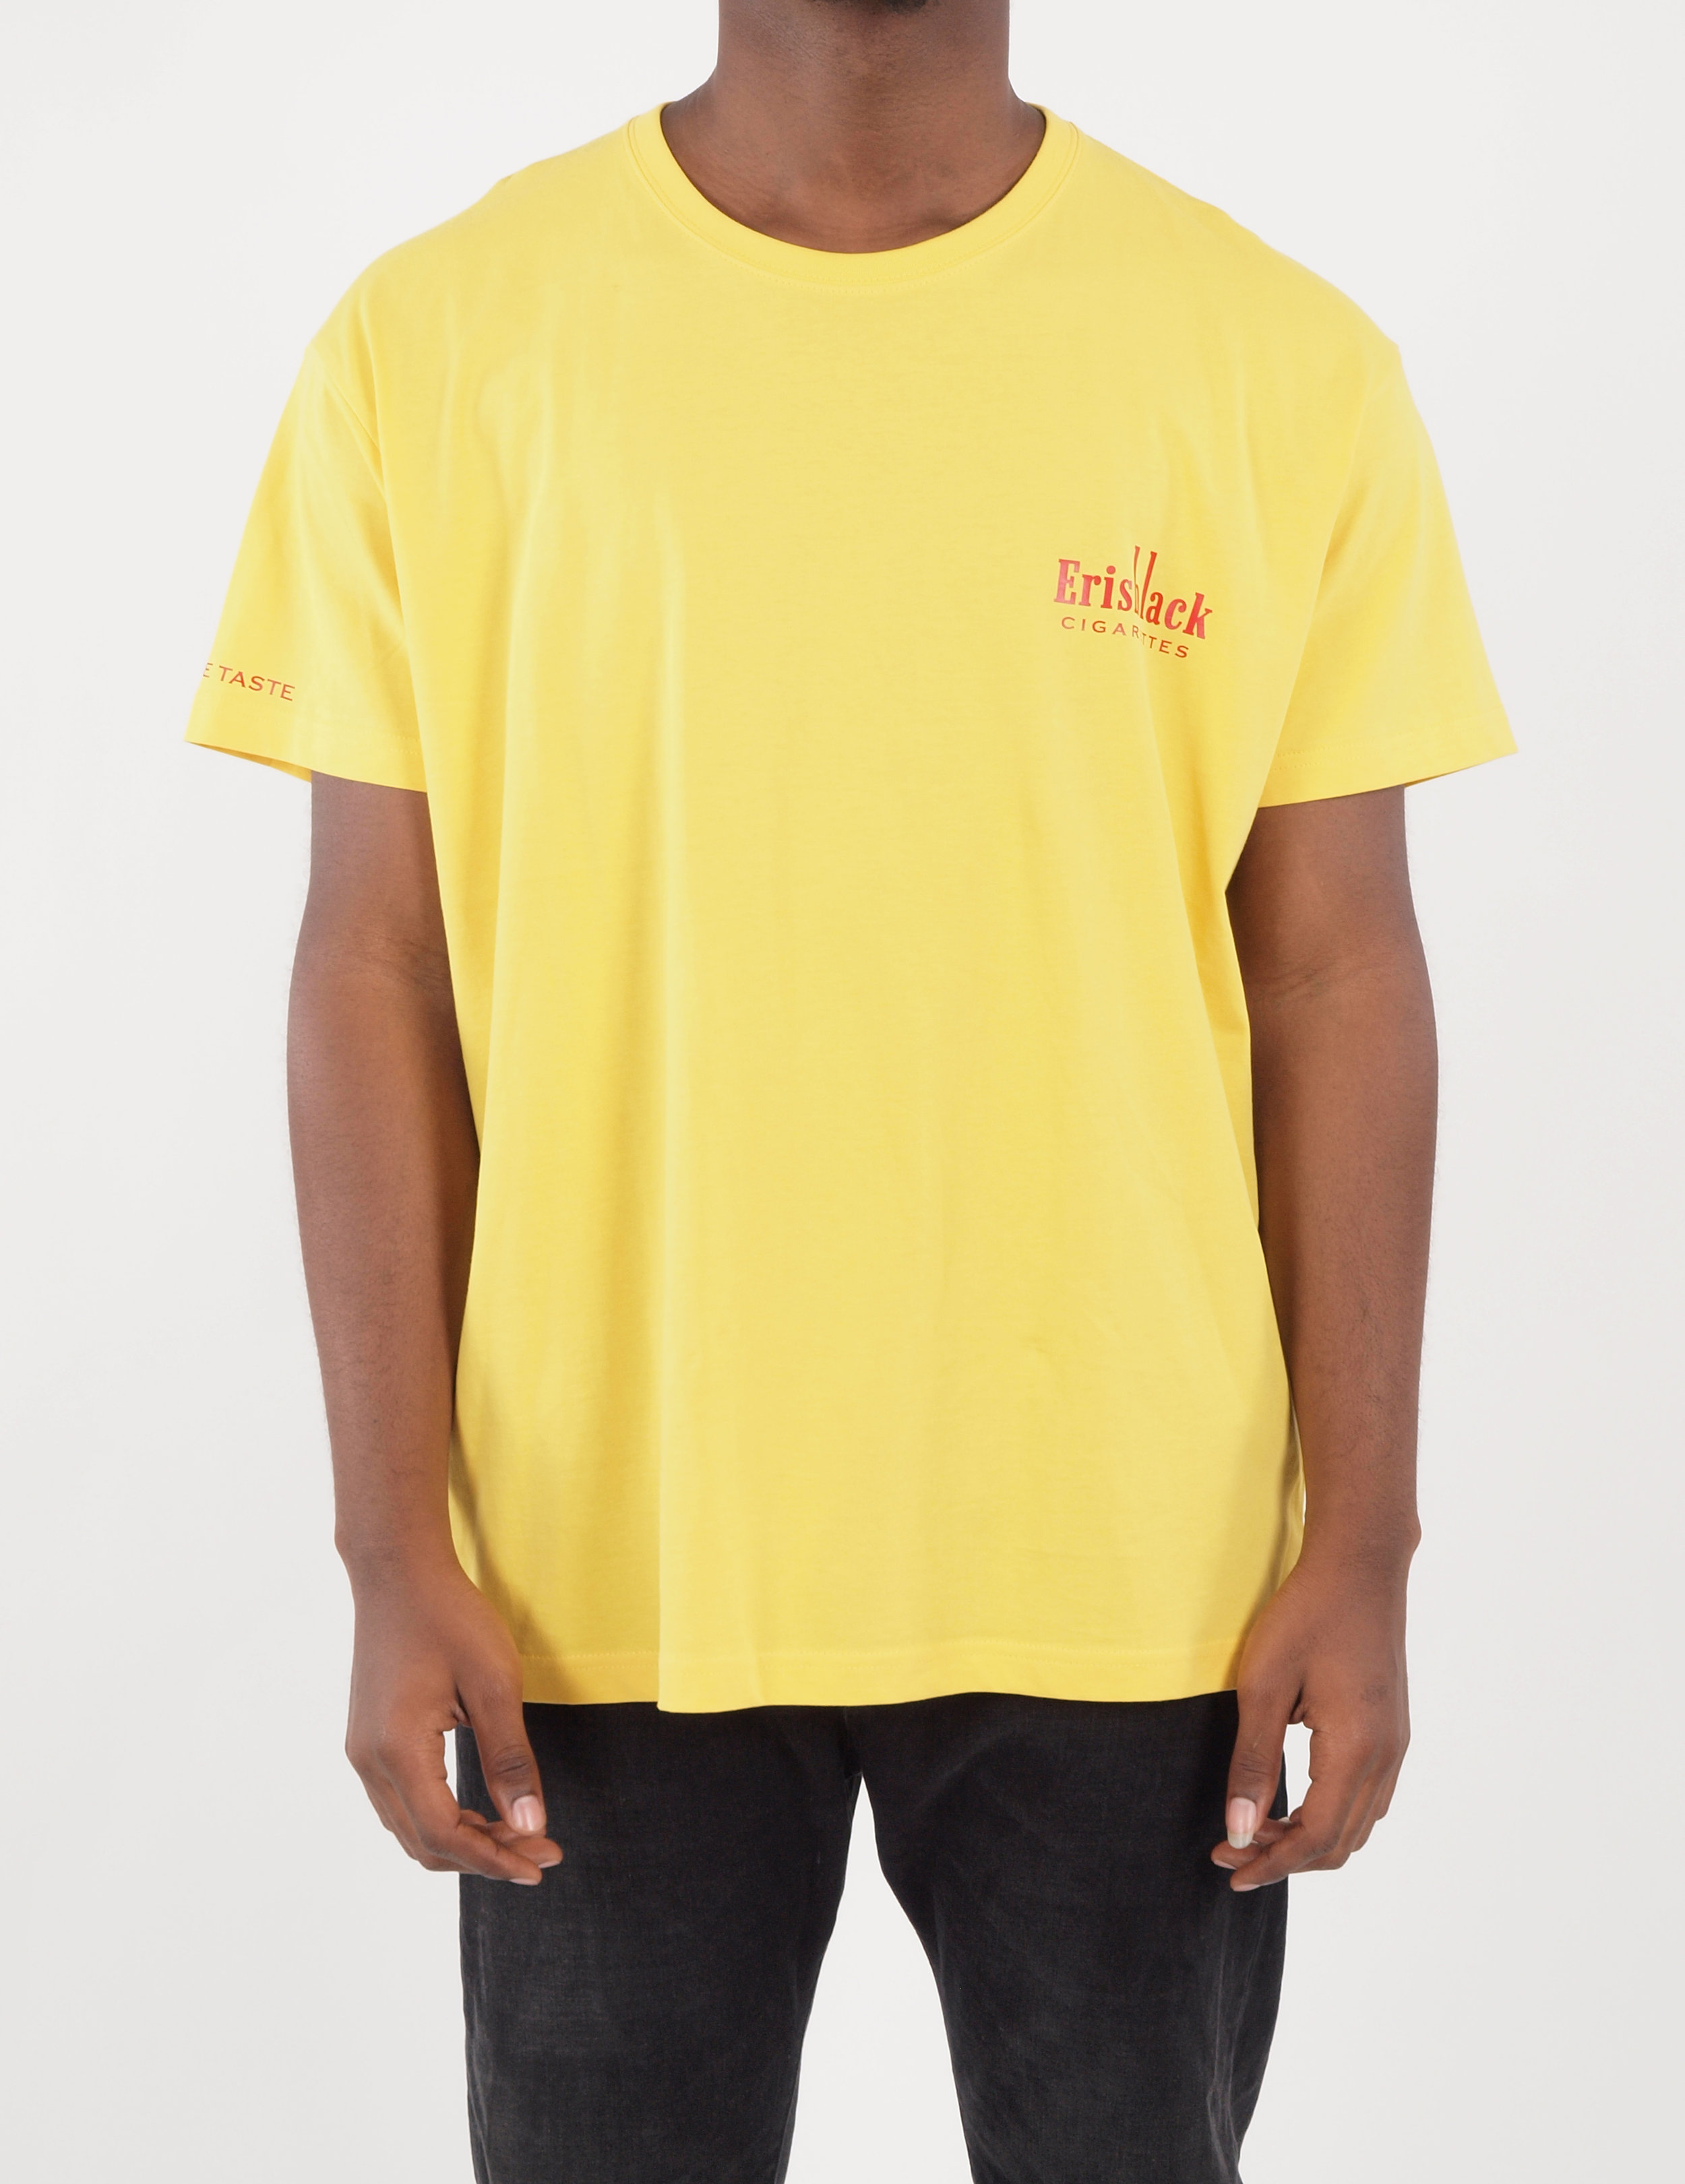 yellow cig t.jpg